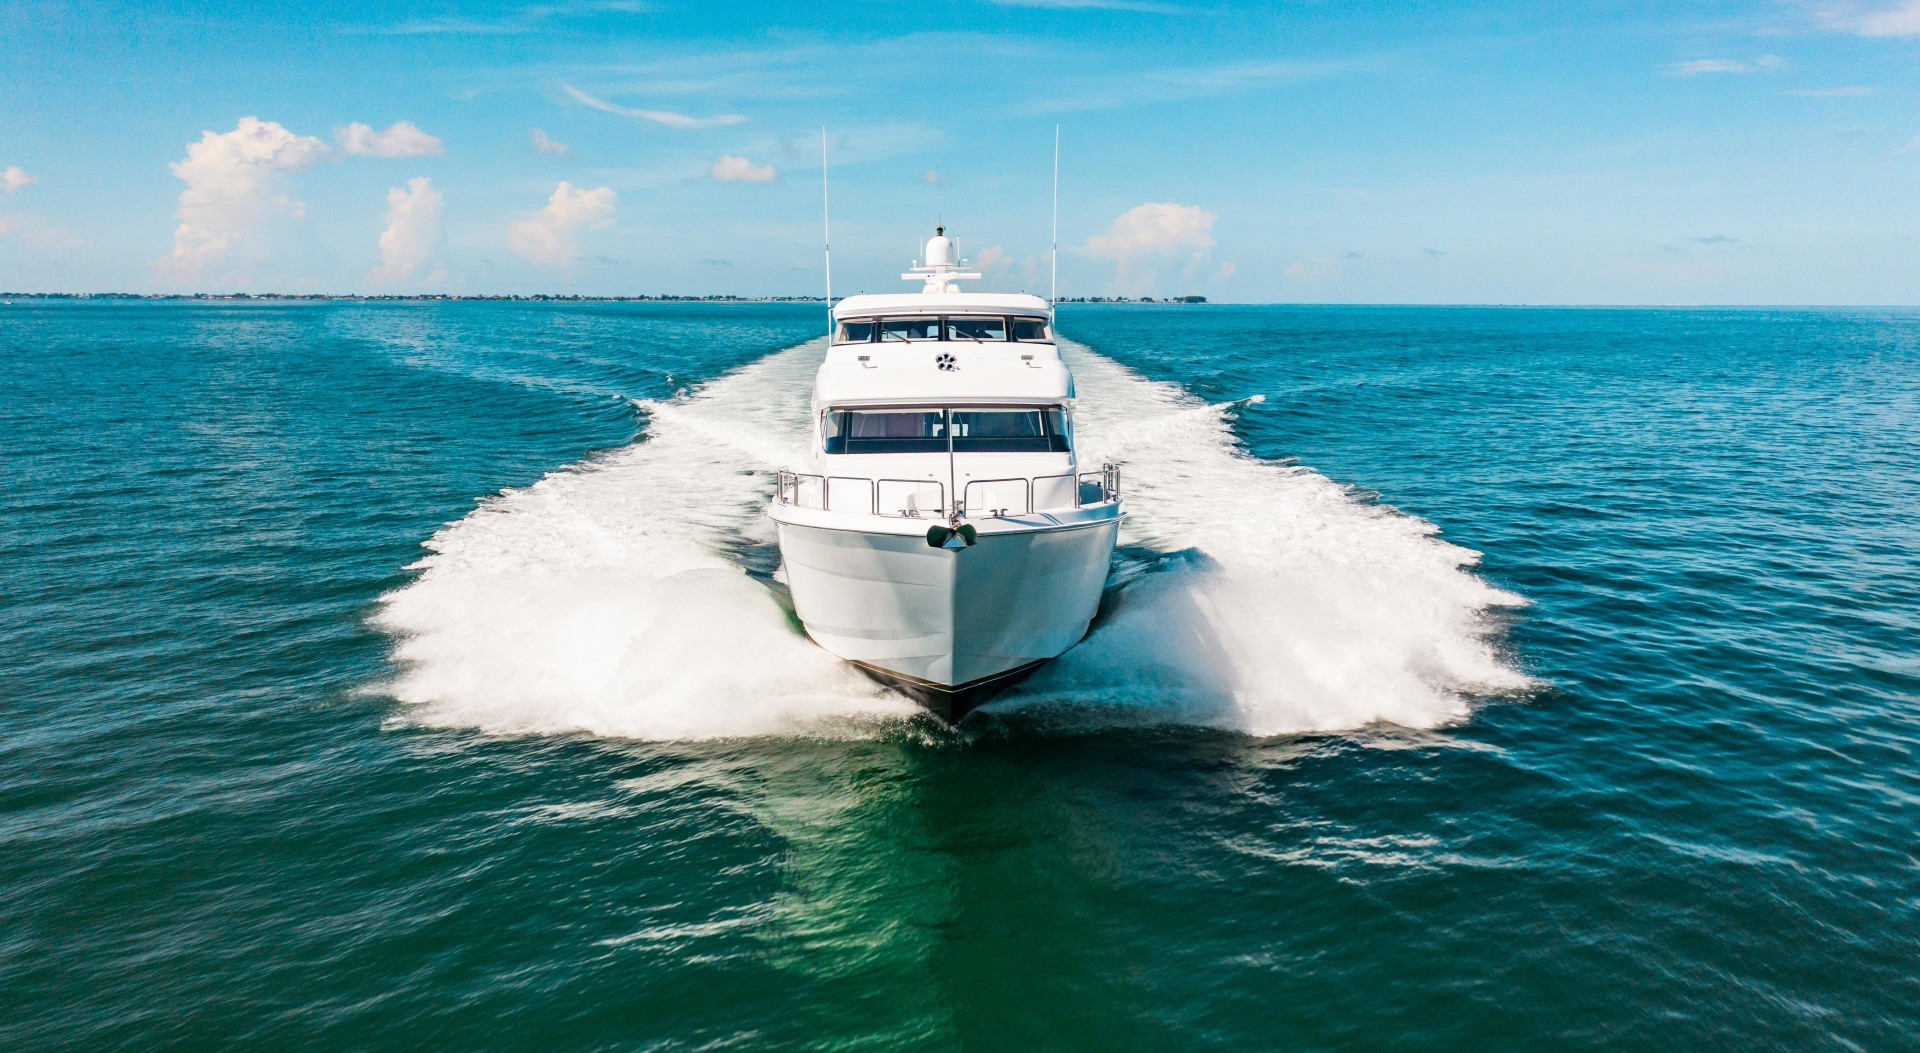 Hatteras-80 Motor Yacht 2008-Galati Yacht Sales Trade Anna Maria-Florida-United States-2008 Hatteras 80 Motor Yacht  Galati Yacht Sales Trade-1466277 | Thumbnail